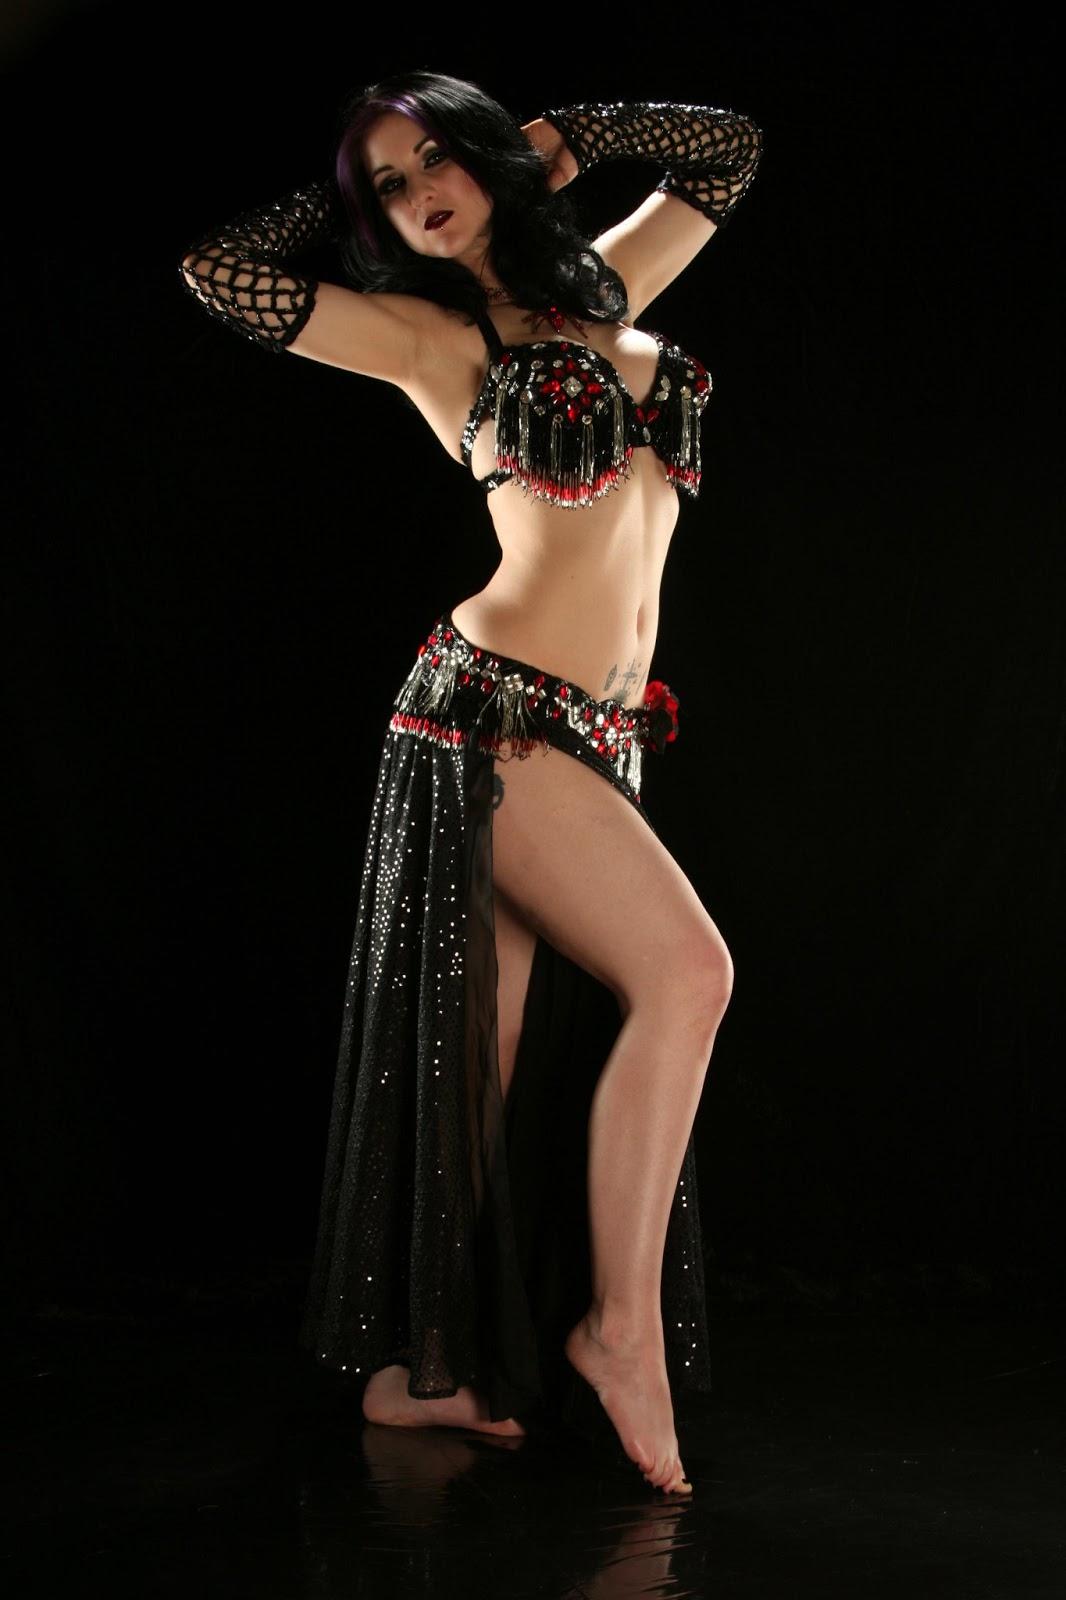 Hot Sexy Nude Dance